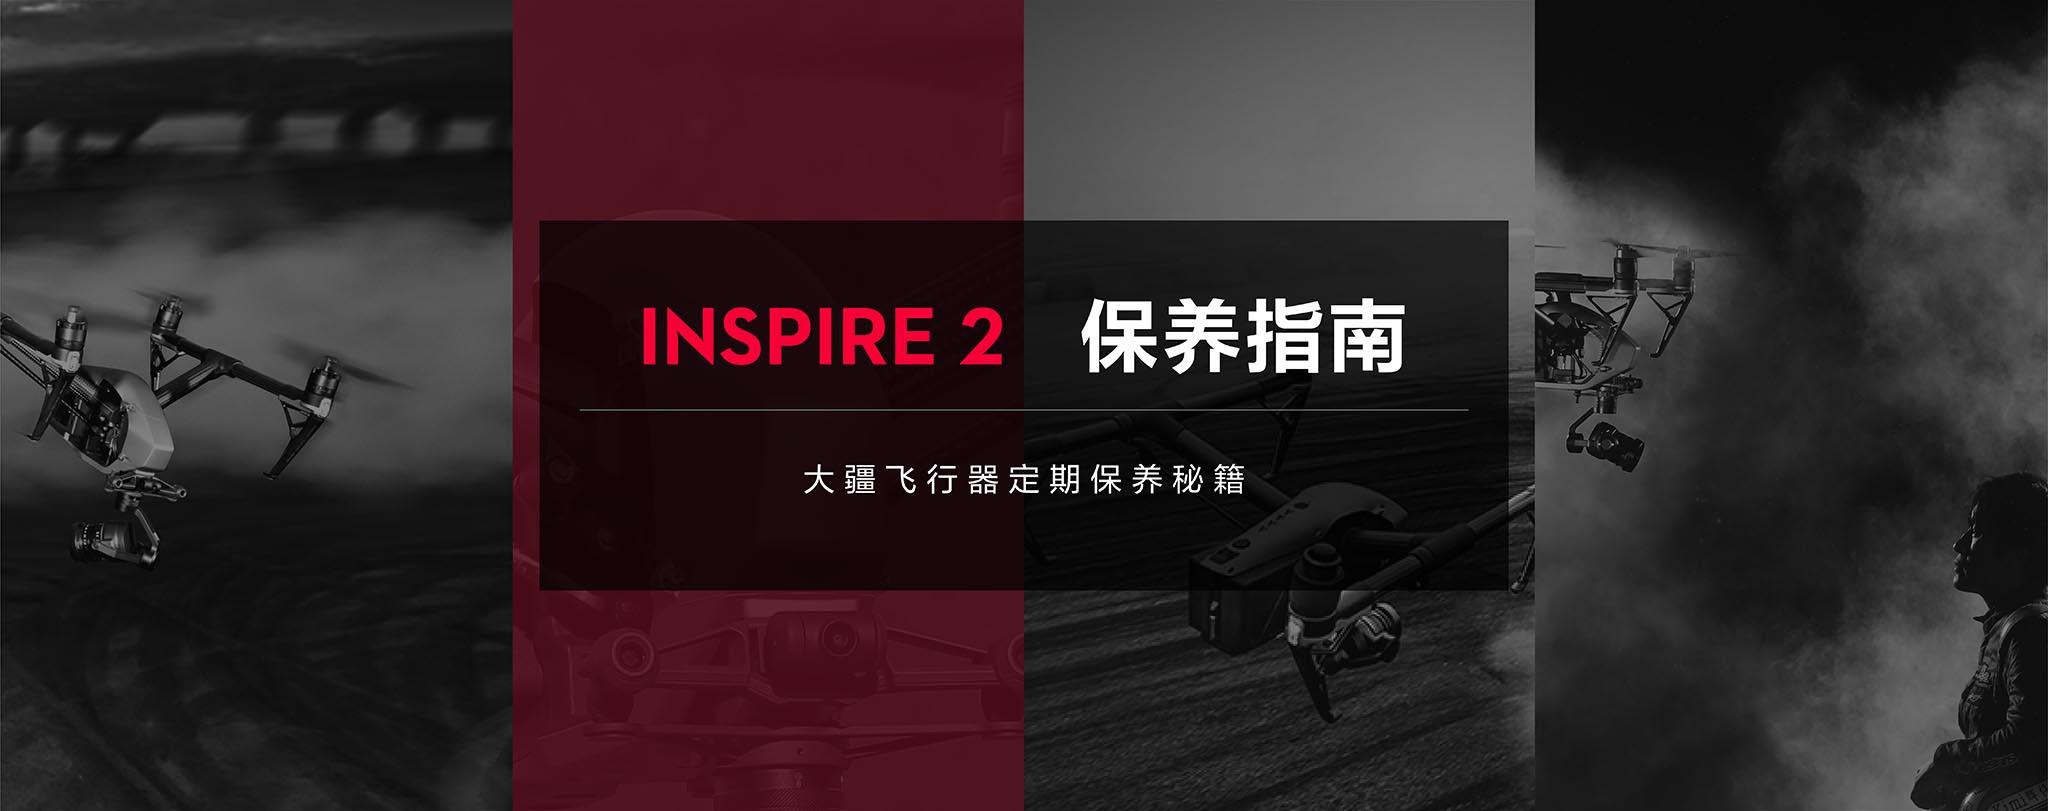 inspire 2淇濆吇-澶村浘-CN.jpg